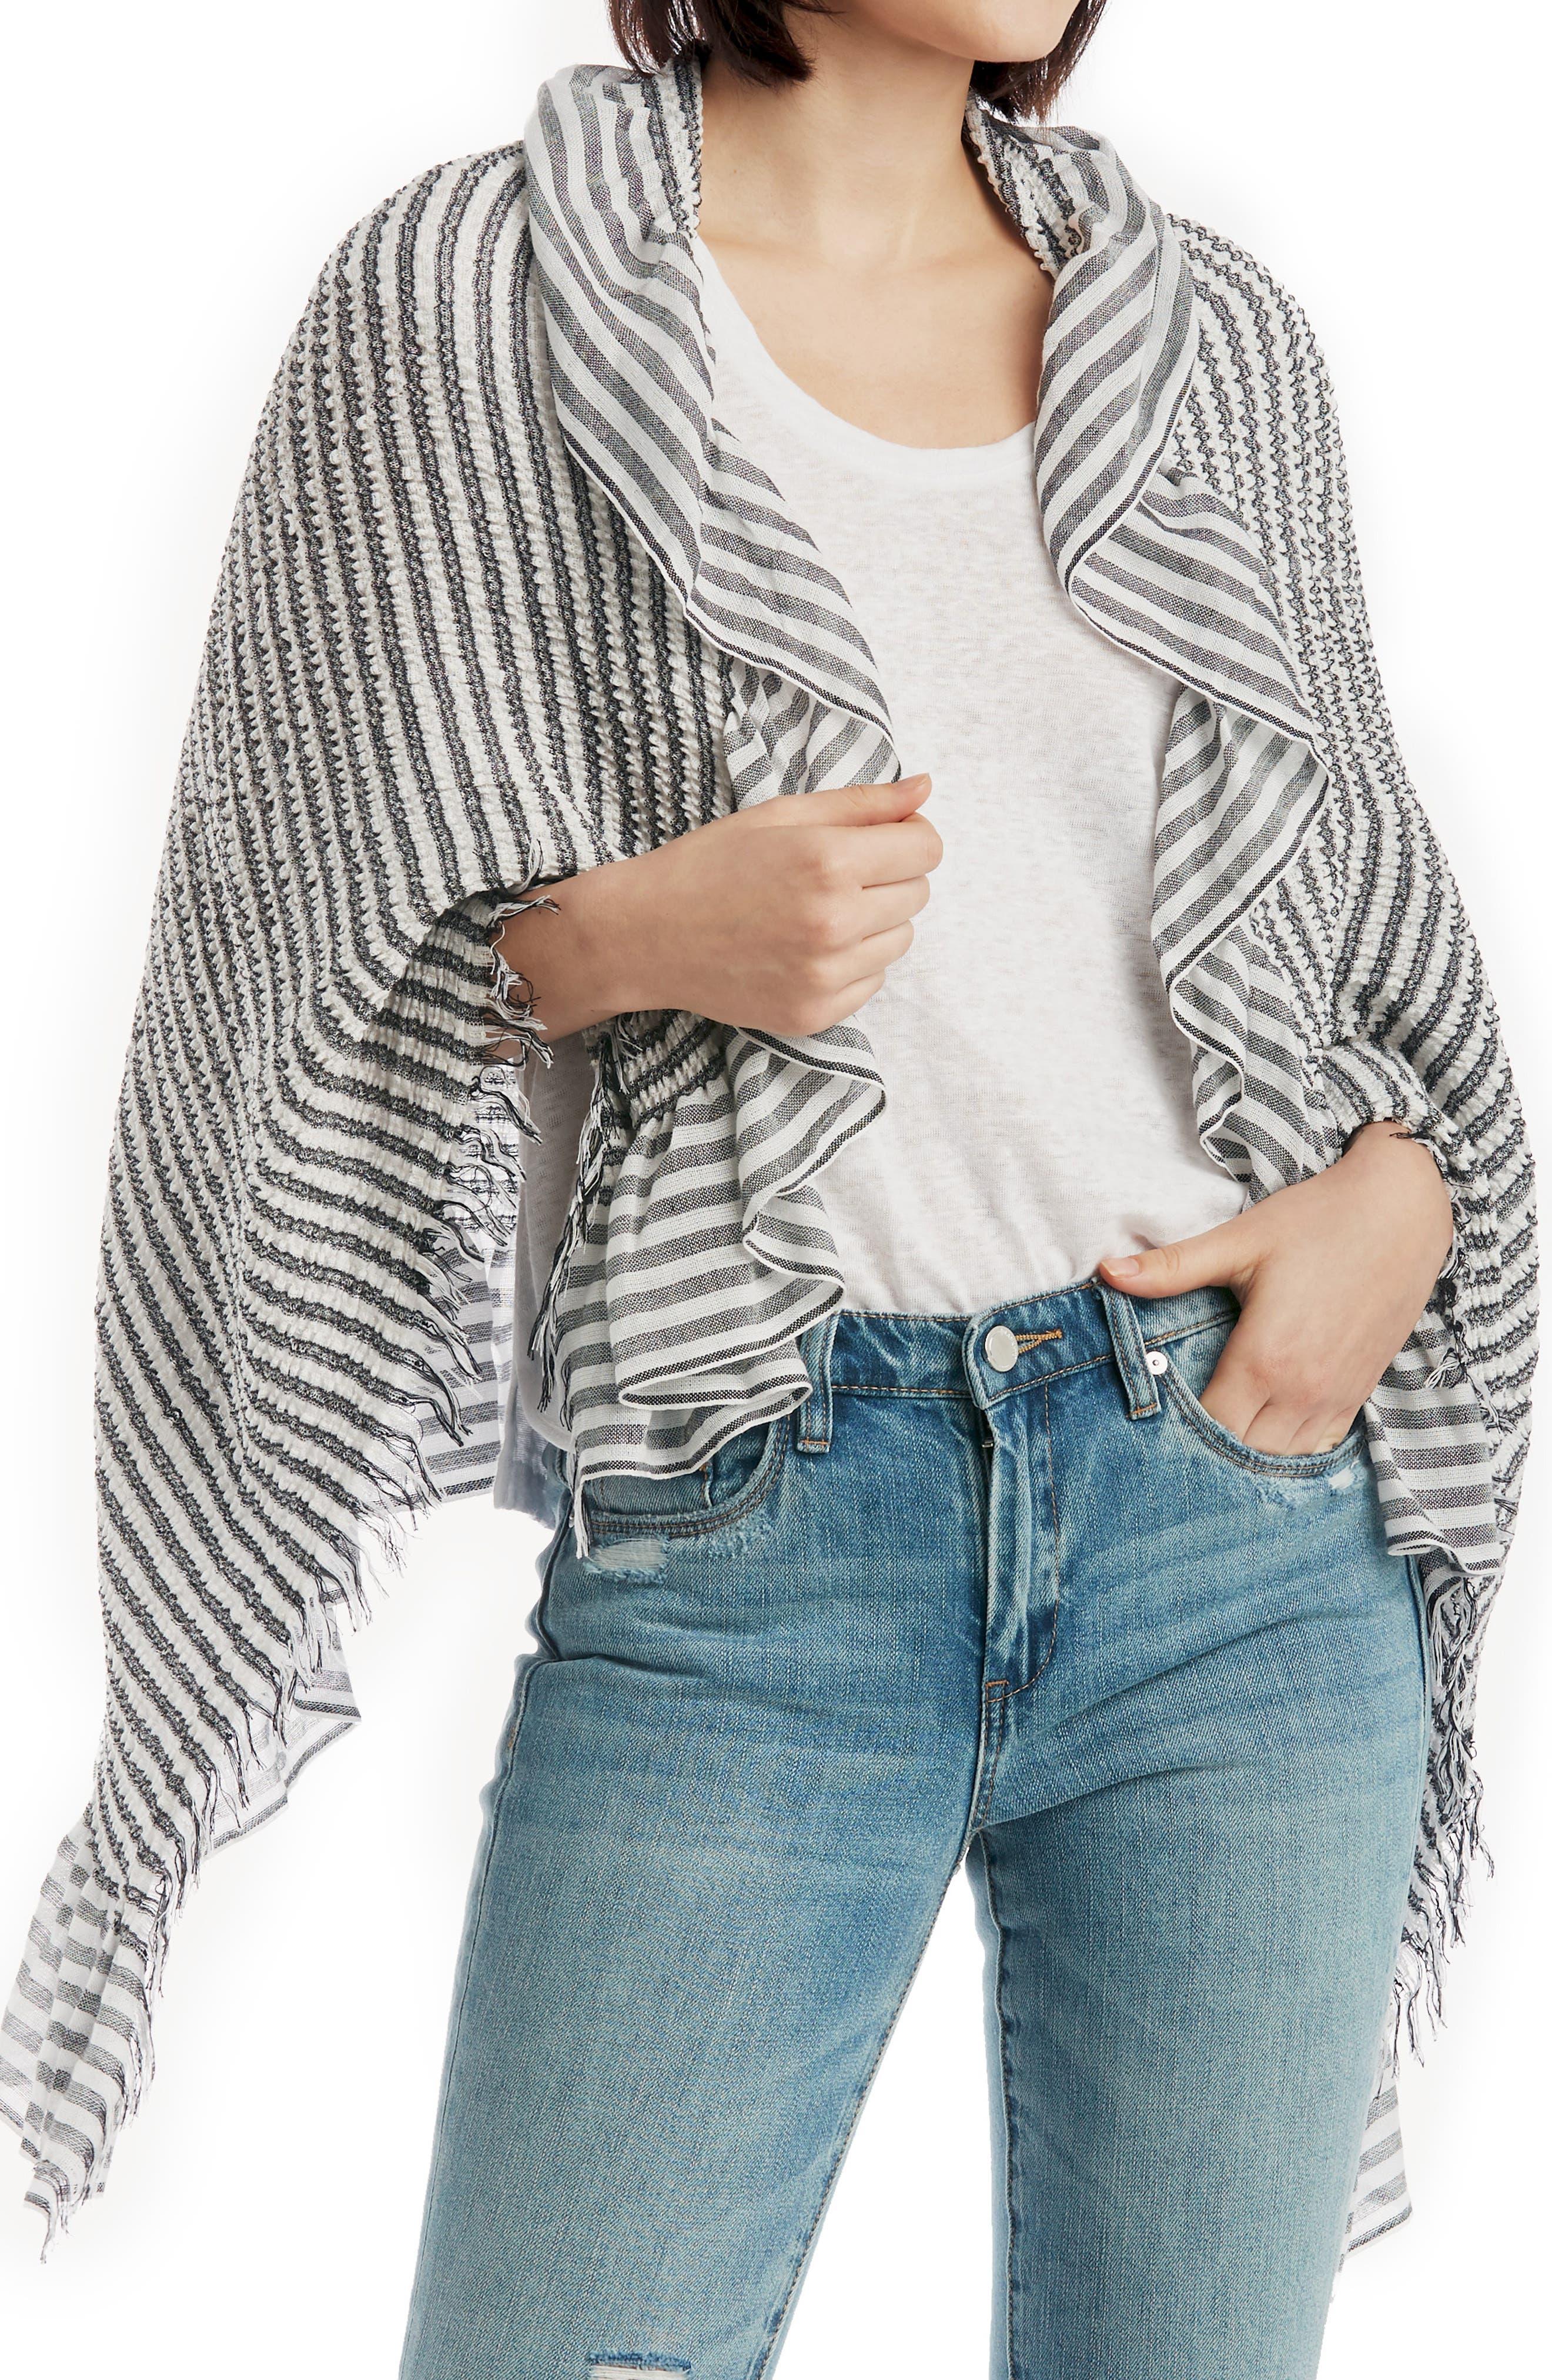 SOLE SOCIETY, Oversized Stripe Wrap, Main thumbnail 1, color, BLACK WHITE STRIPE